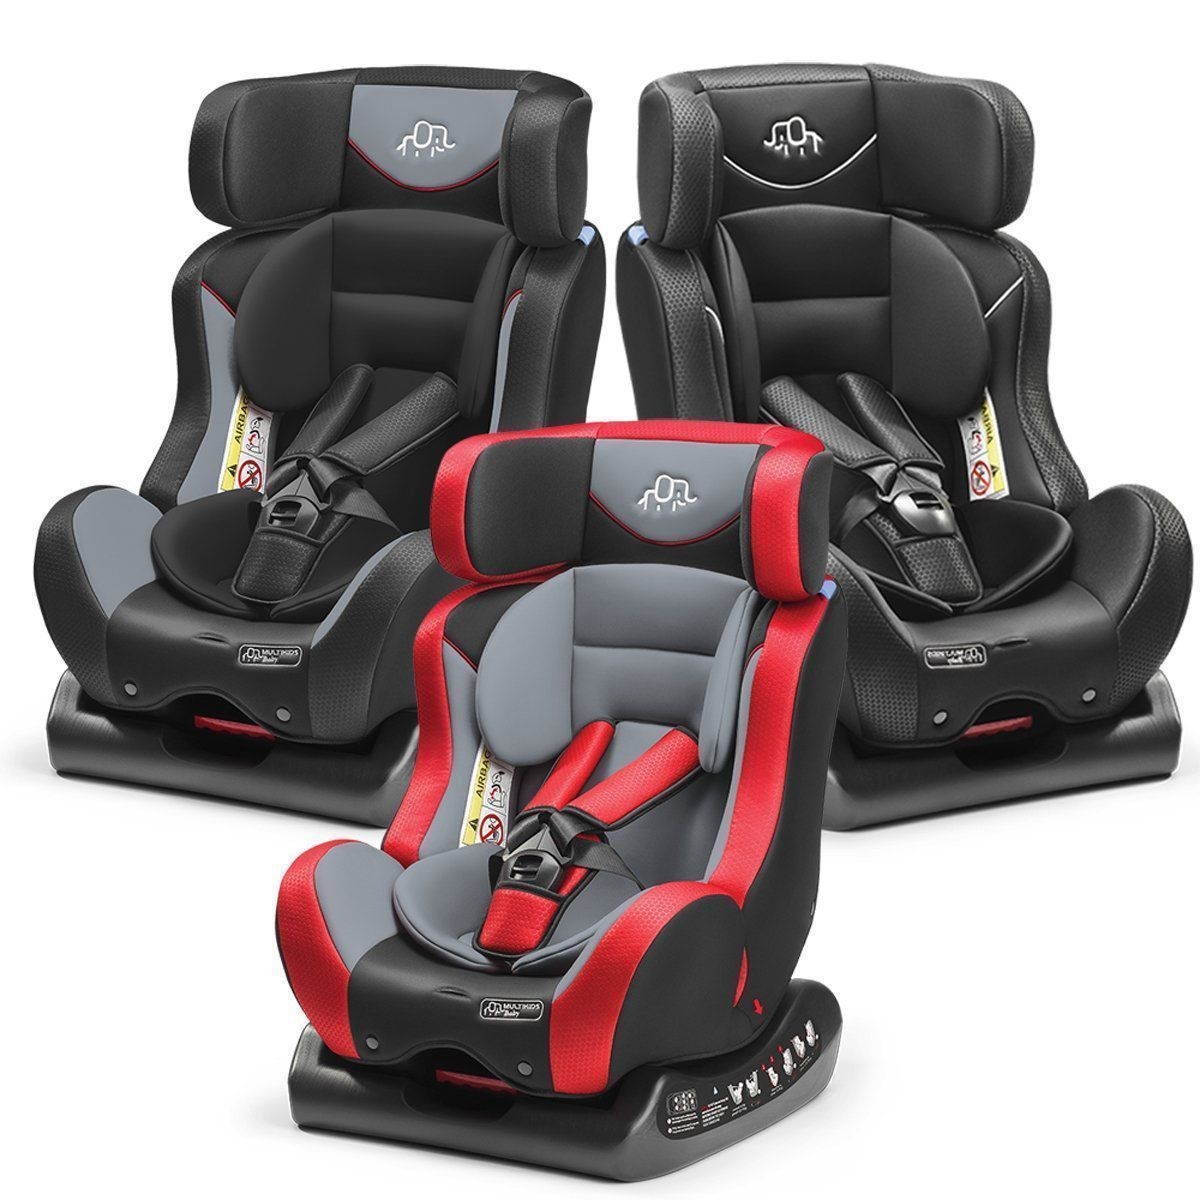 Cadeira Automotiva Kids 0-25 KG Multikds